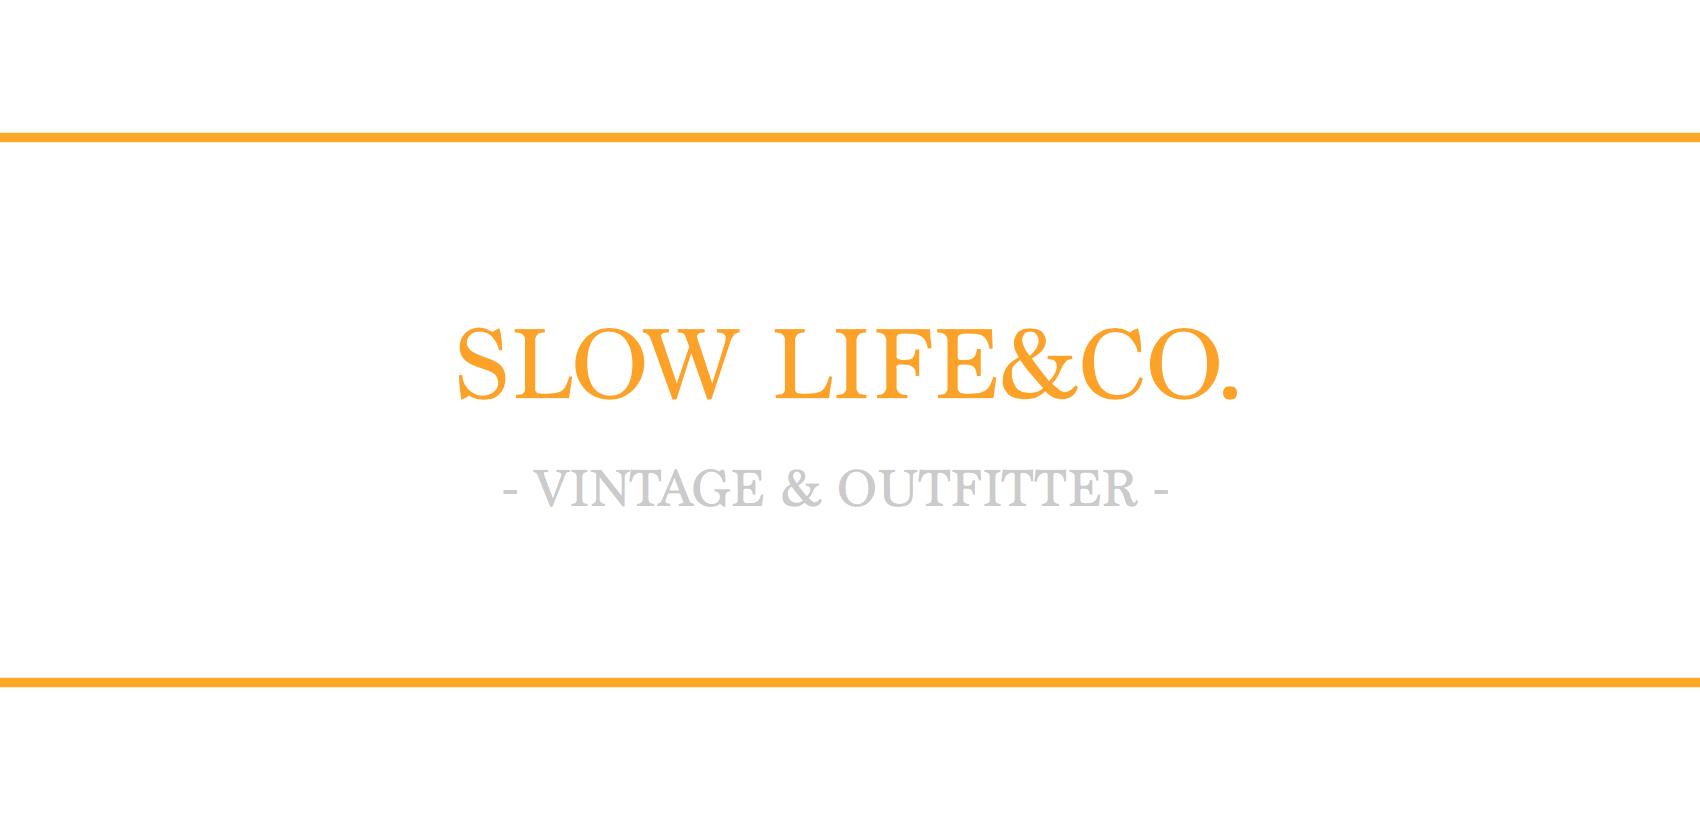 SLOW LIFE&CO.